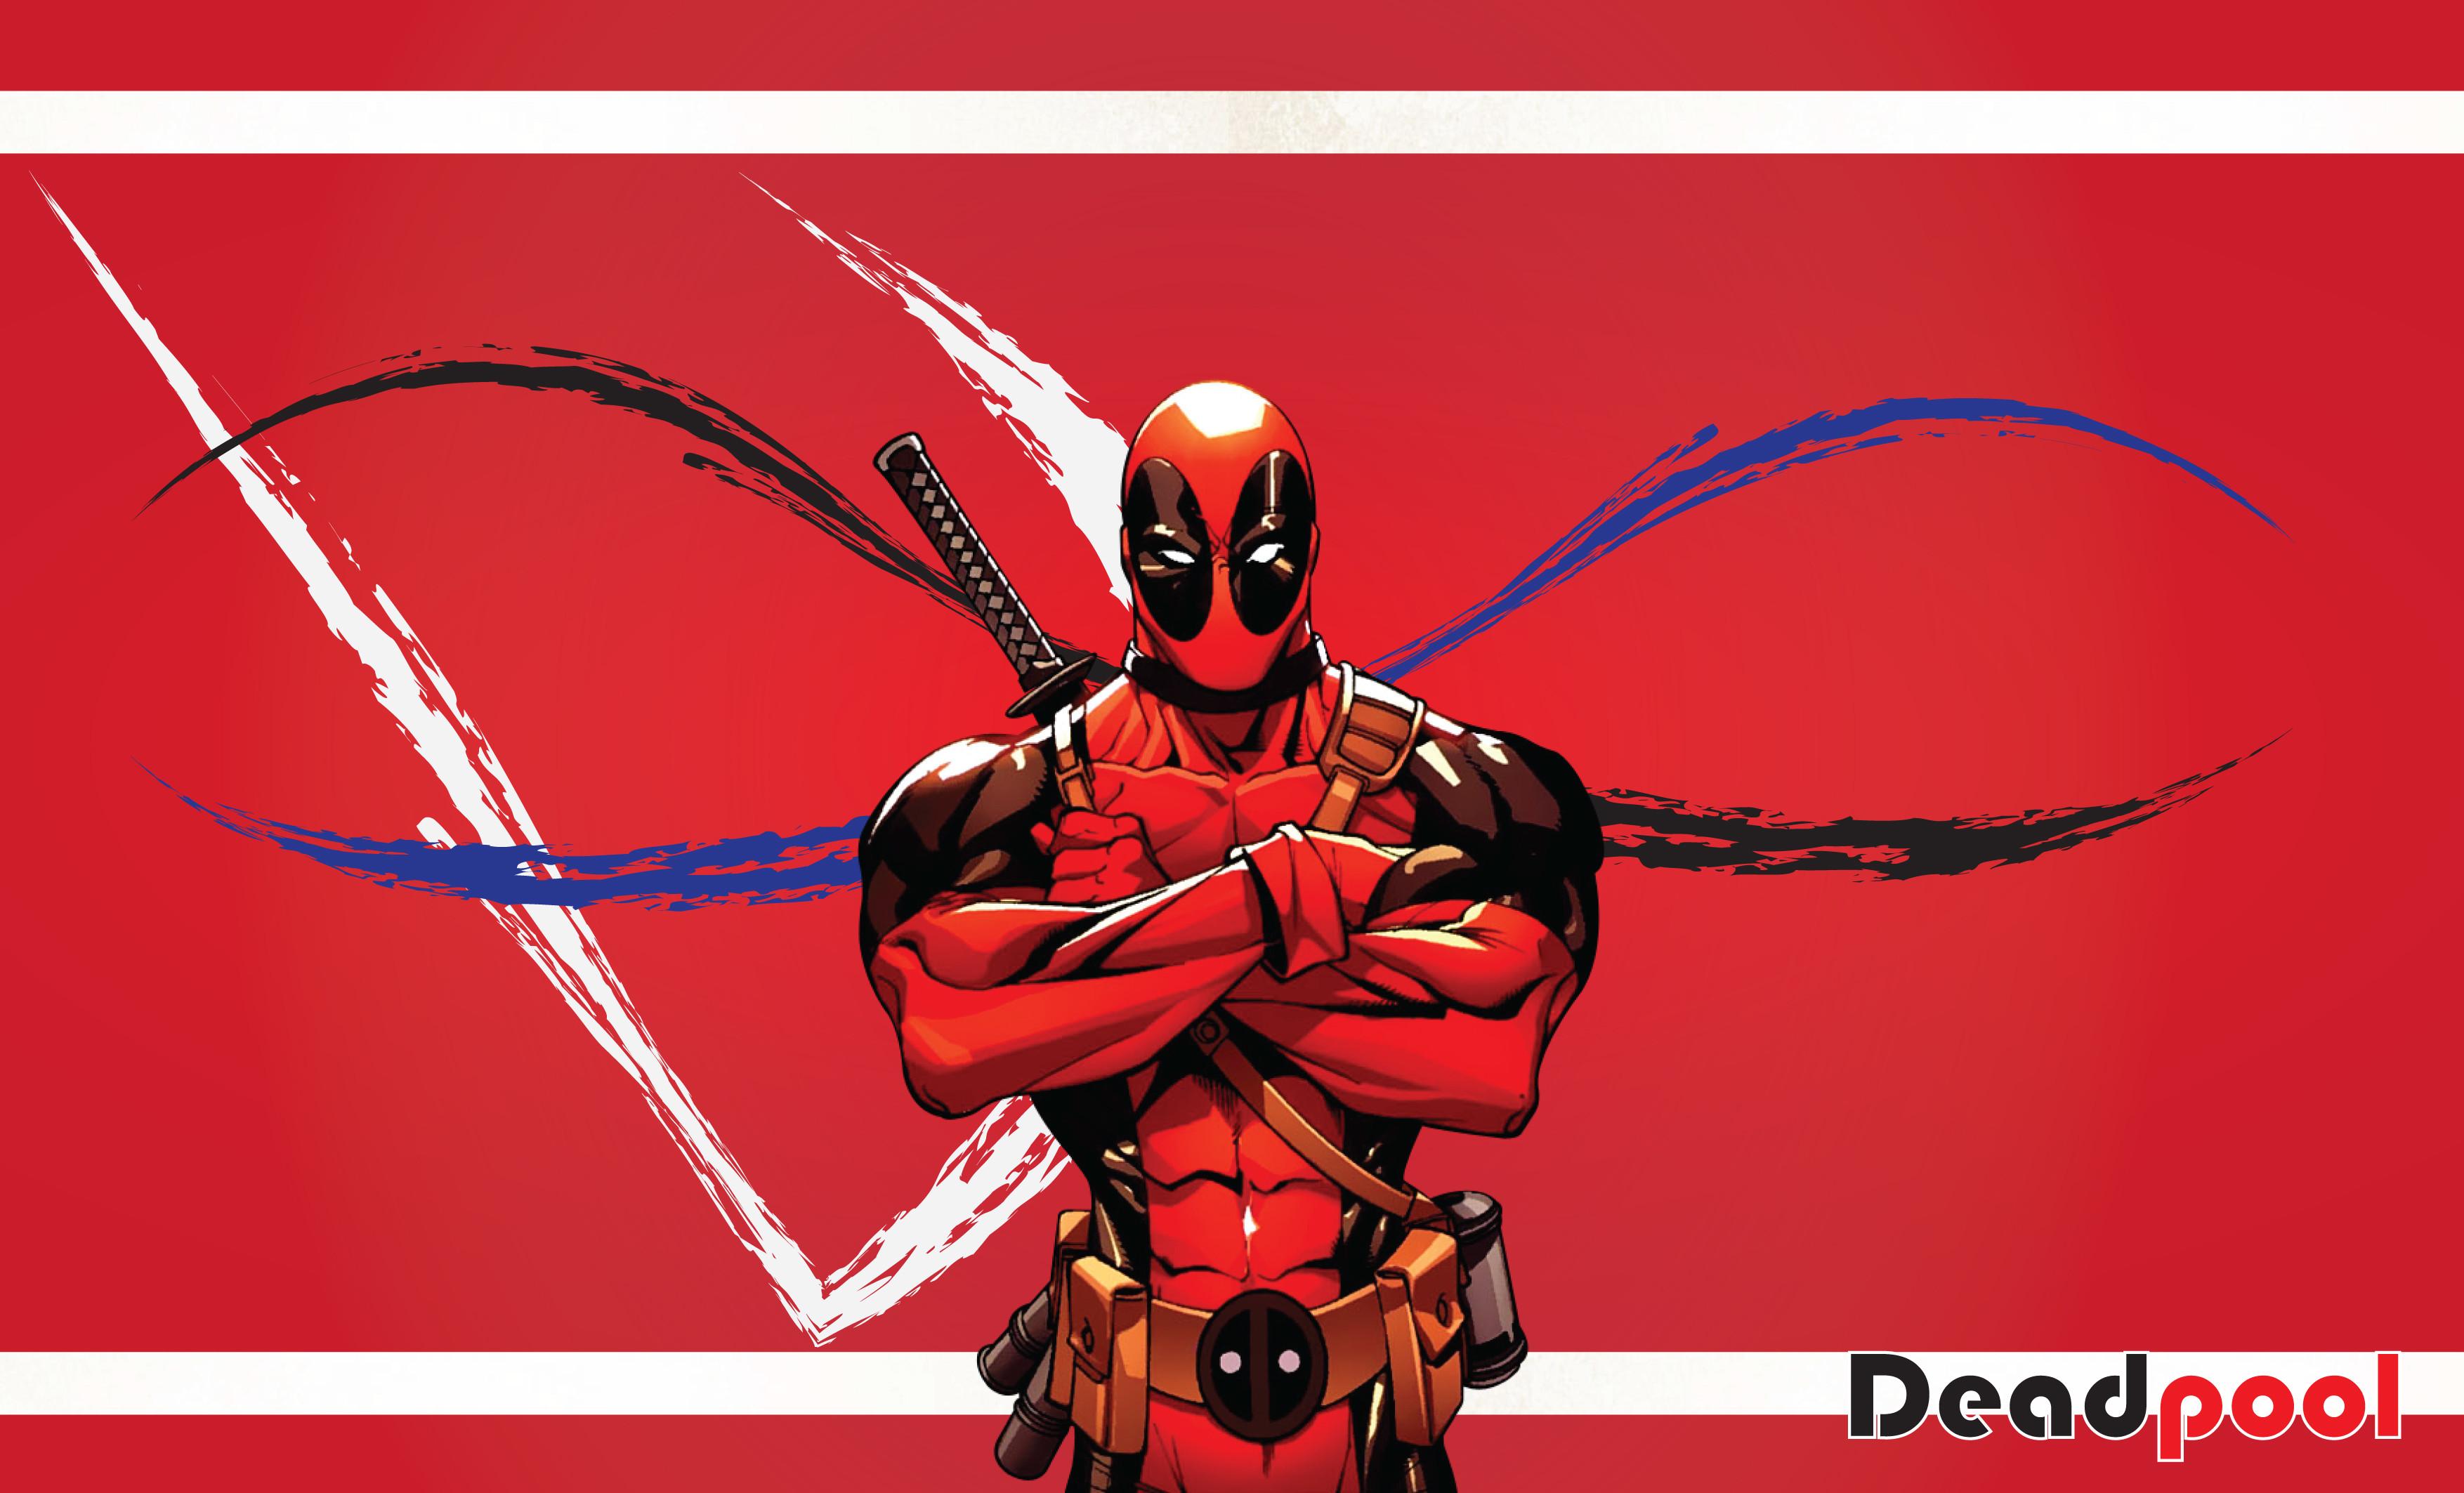 So-Cool-Deadpool-Wallpaper-HD